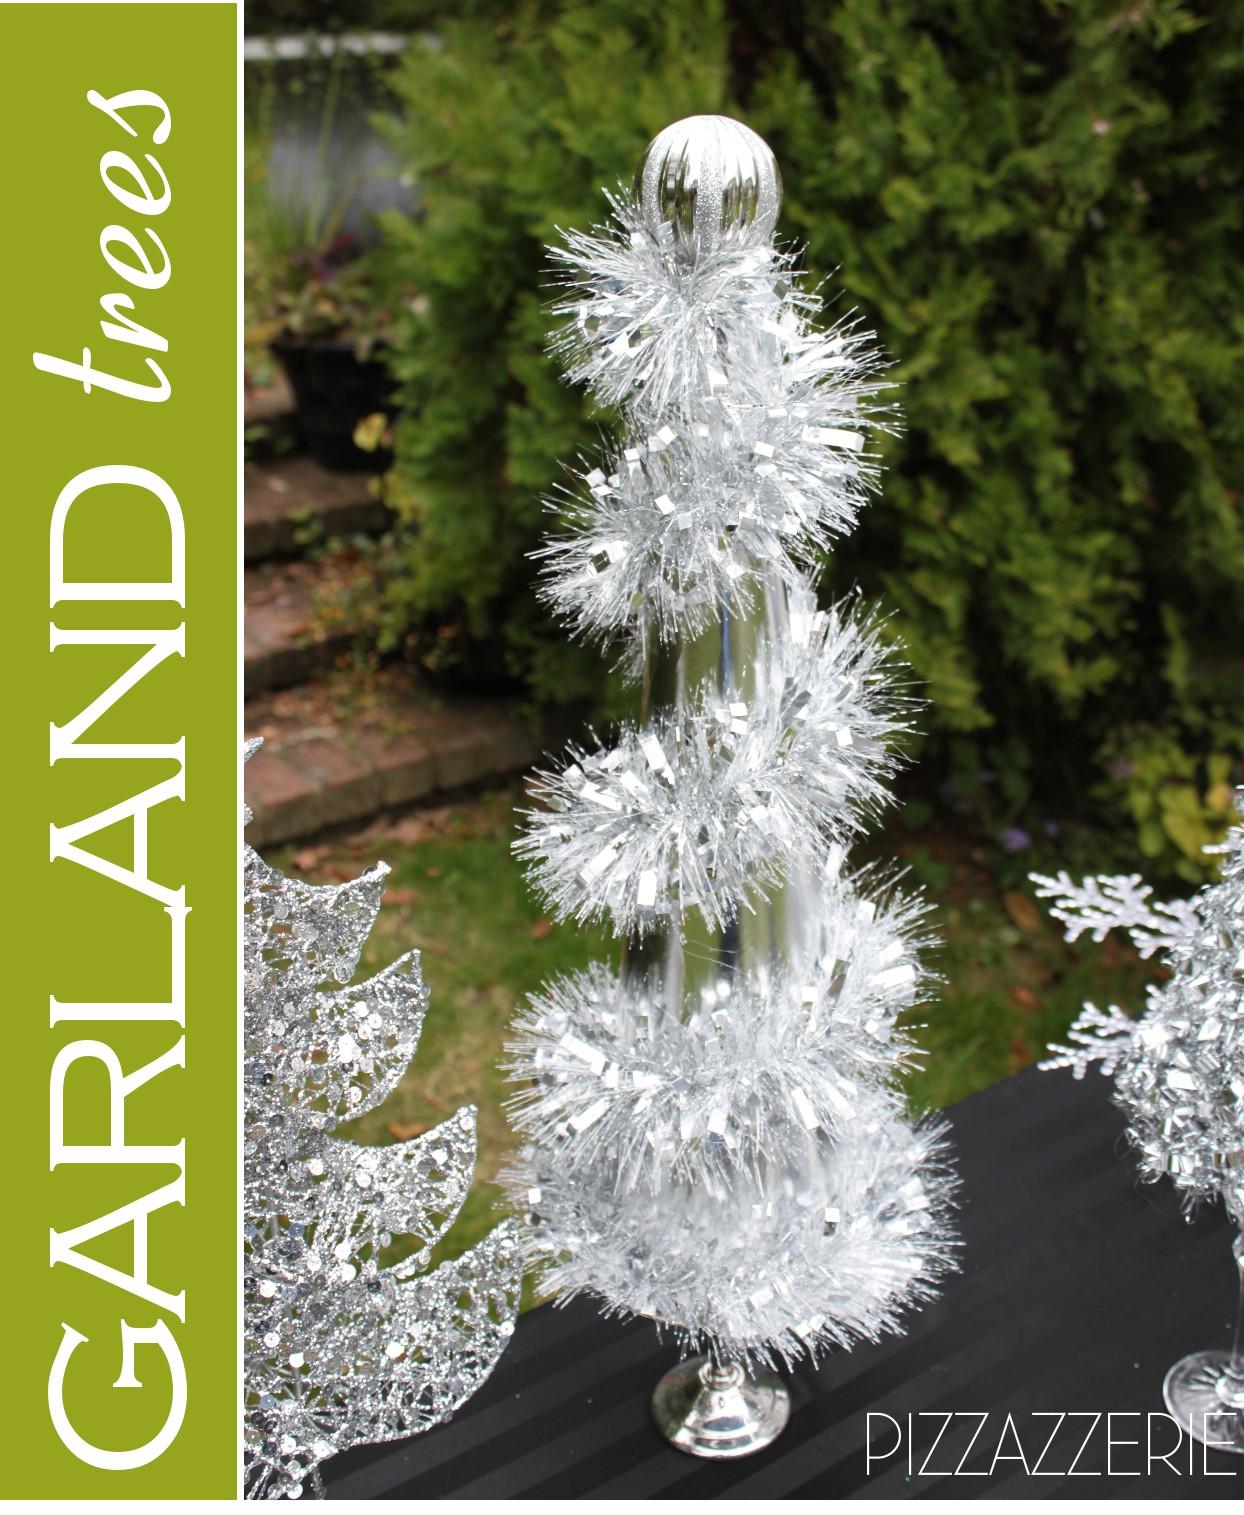 DIY Christmas Tree Garland  Black & White Snowman Holiday Table & DIY Garland Trees